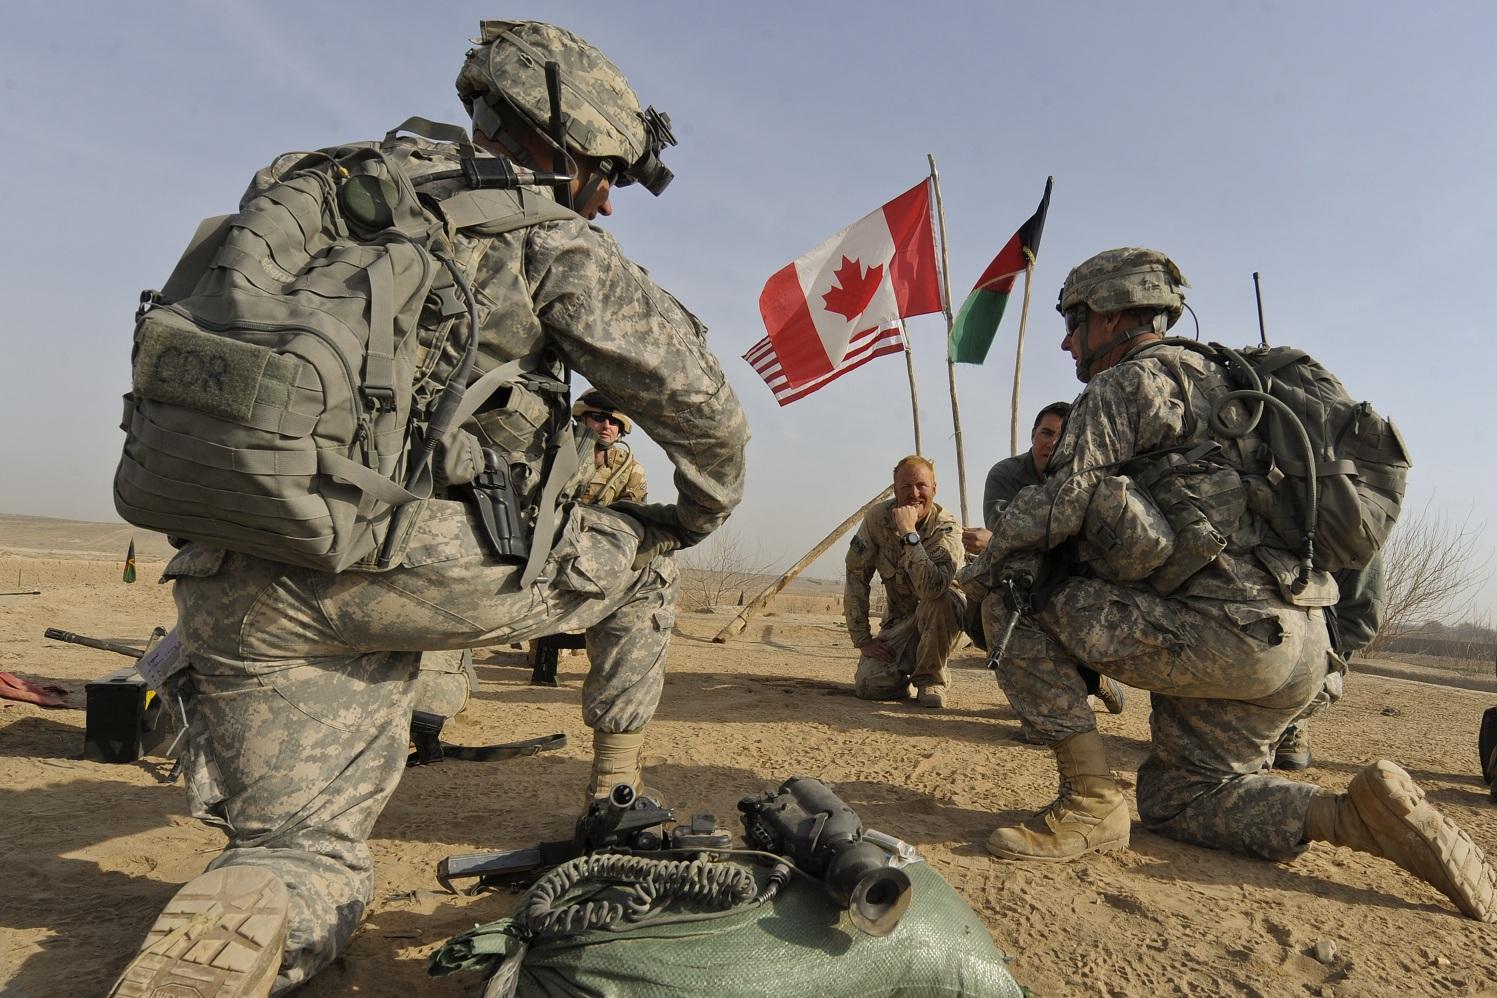 Canadian Military Photos Download Desktop Wallpaper Images 1497x998